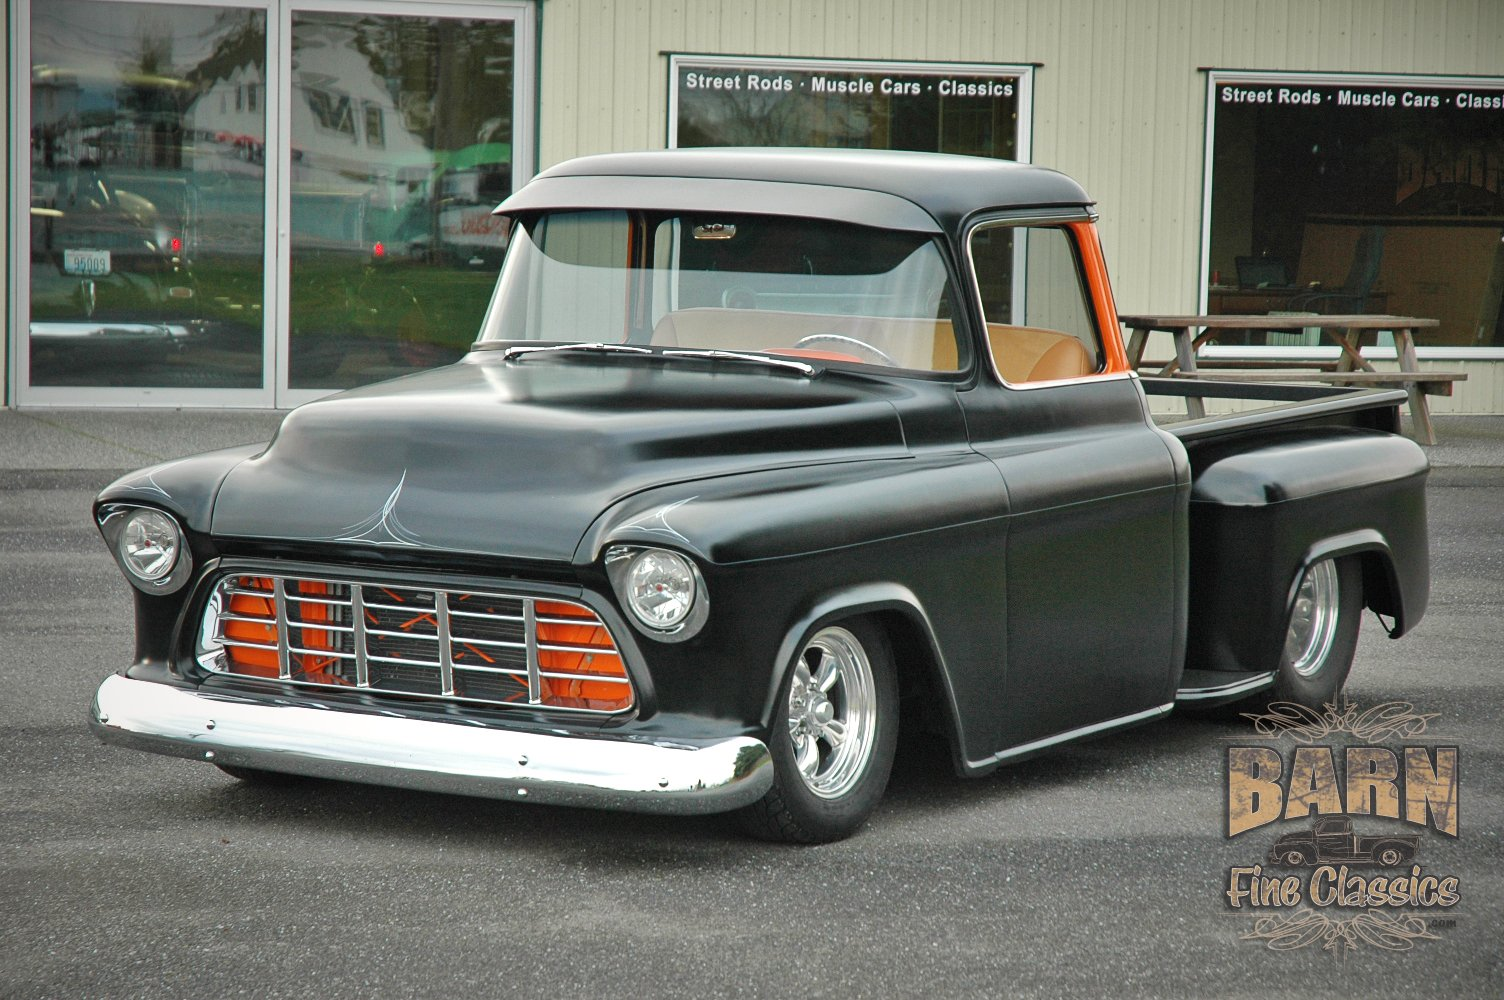 Pro Street Wiring Harness Library 1955 Chevy Chevrolet Pickop Pickup Streetrod Rod Black Usa 1500x1000 03 Wallpaper 1504x1000